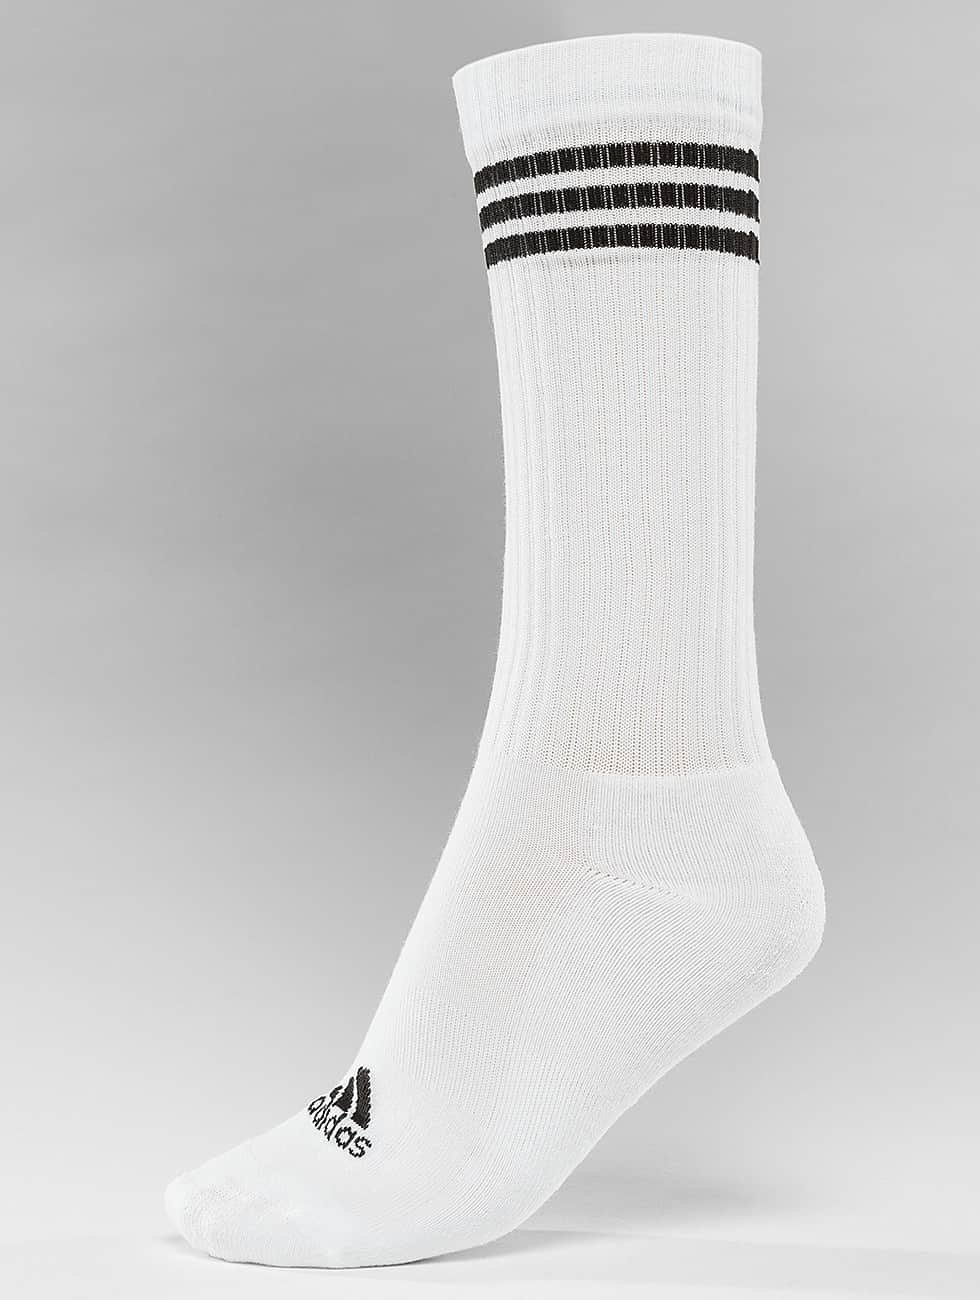 adidas Performance Sokken Performance 3-Stripes wit